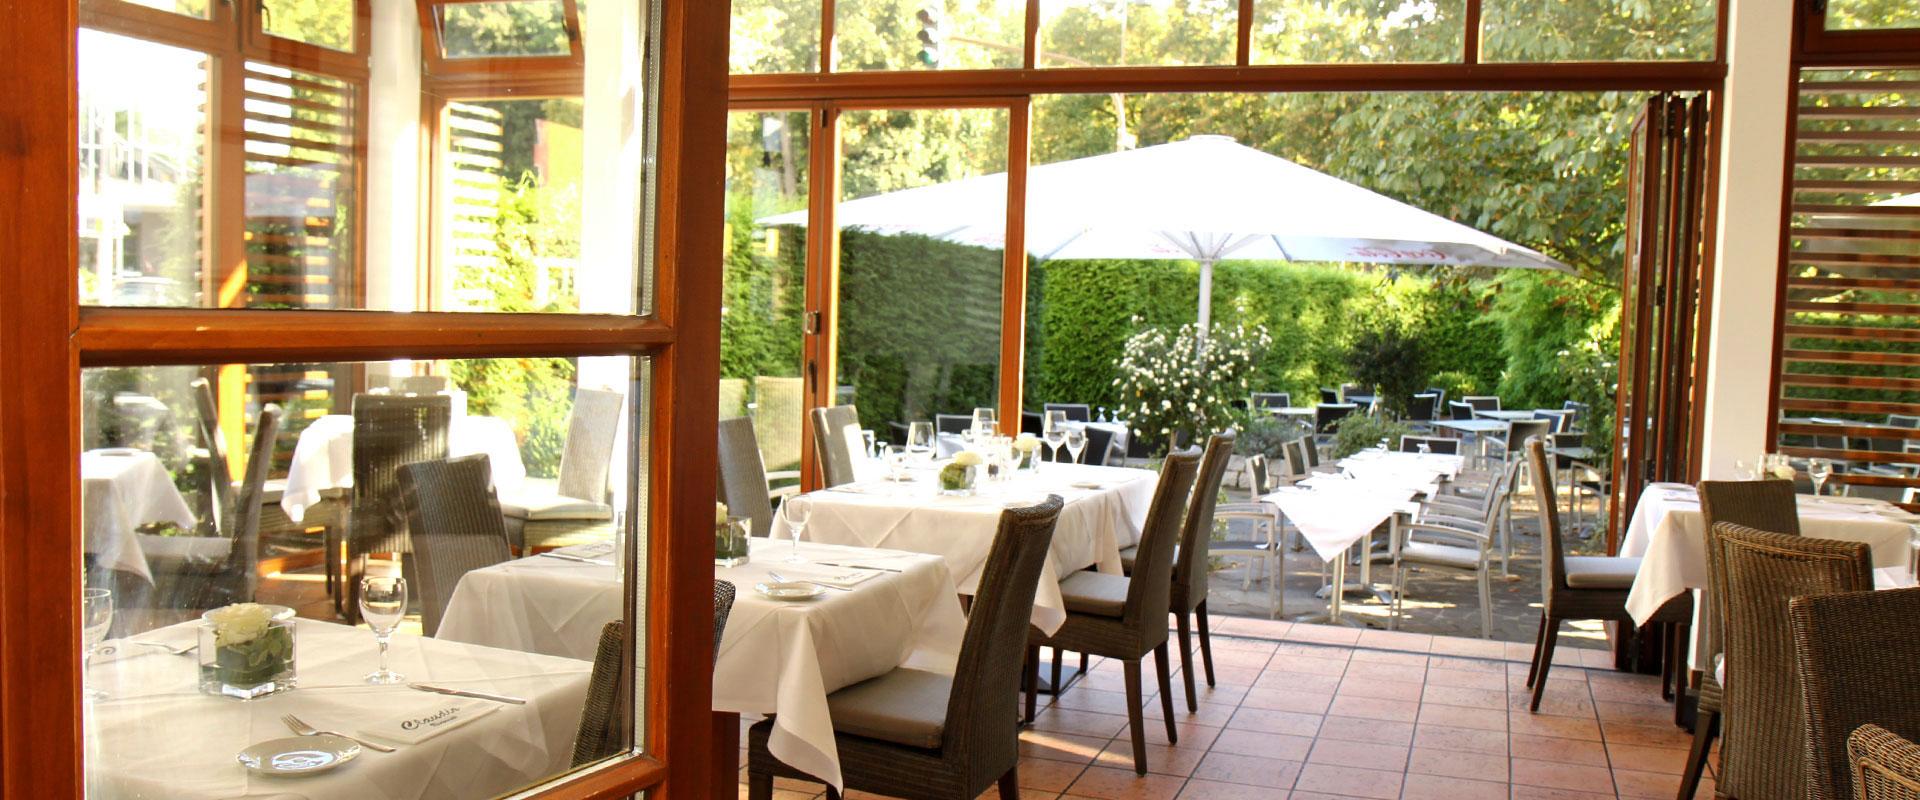 claudio-ristorante-003 ristorante - claudio ristorante 003 - Home